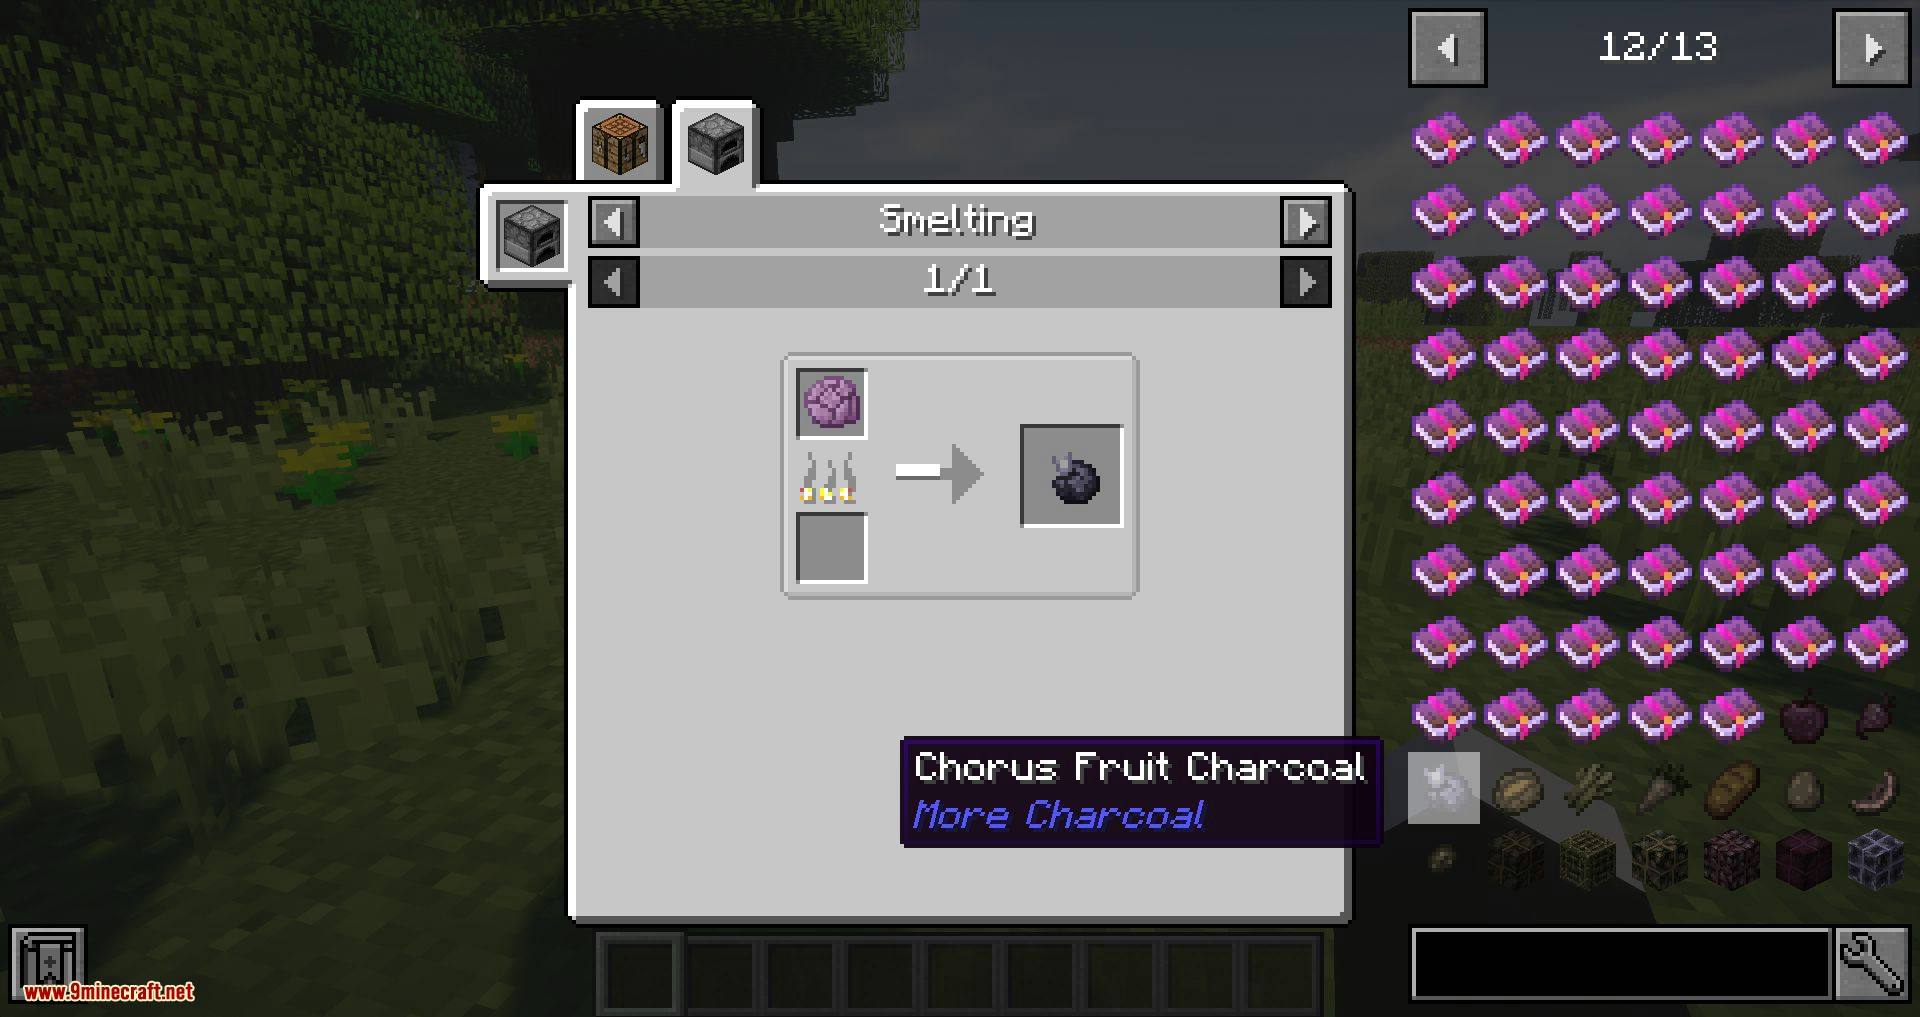 More Charcoal Mod 1 16 4 1 15 2 Charcoal Based On Items Blocks 9minecraft Net Minecraft 1.9 chorus fruit teleporting minecraft myth busting 89. 9minecraft